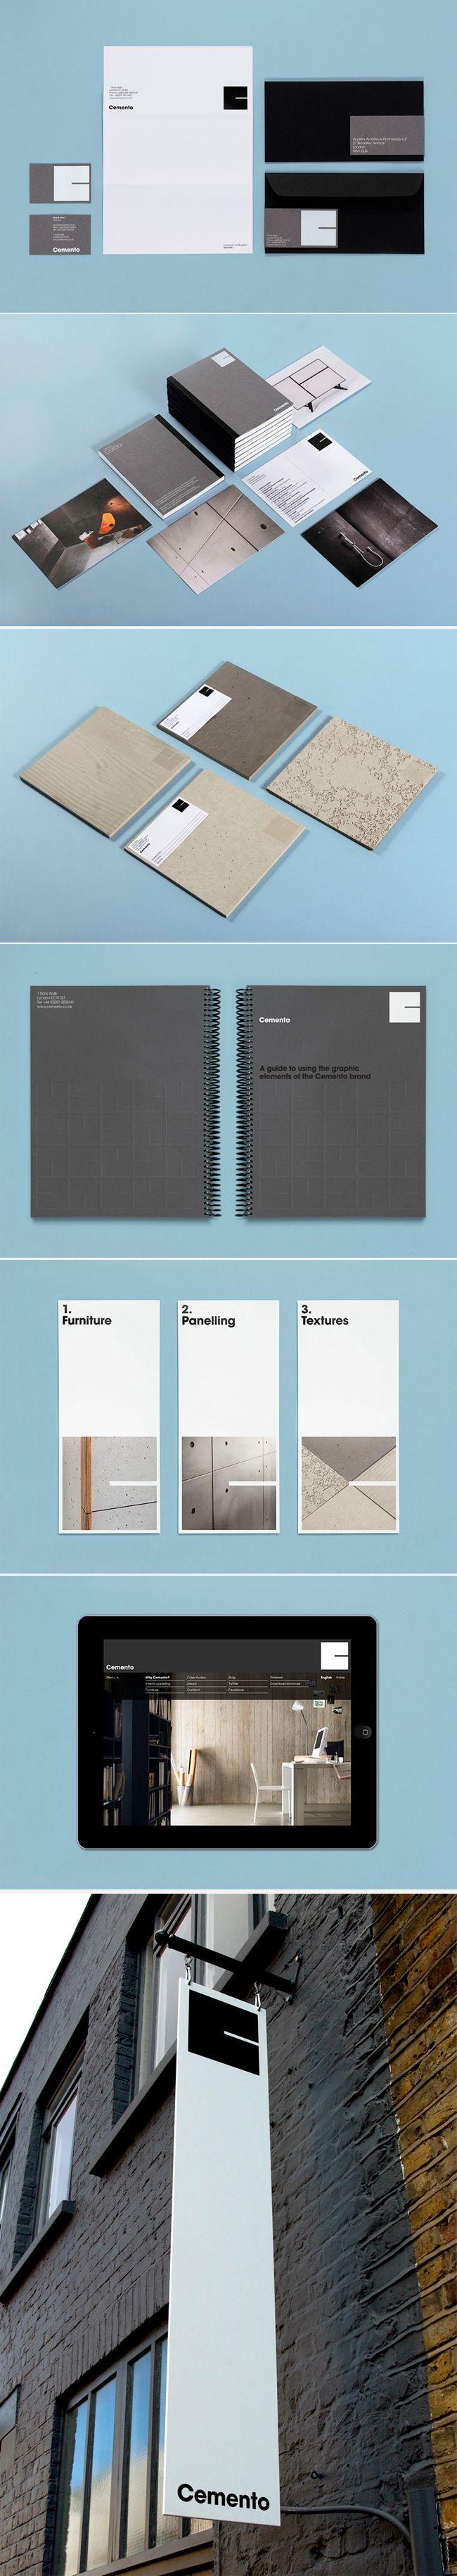 Cemento Brand ID